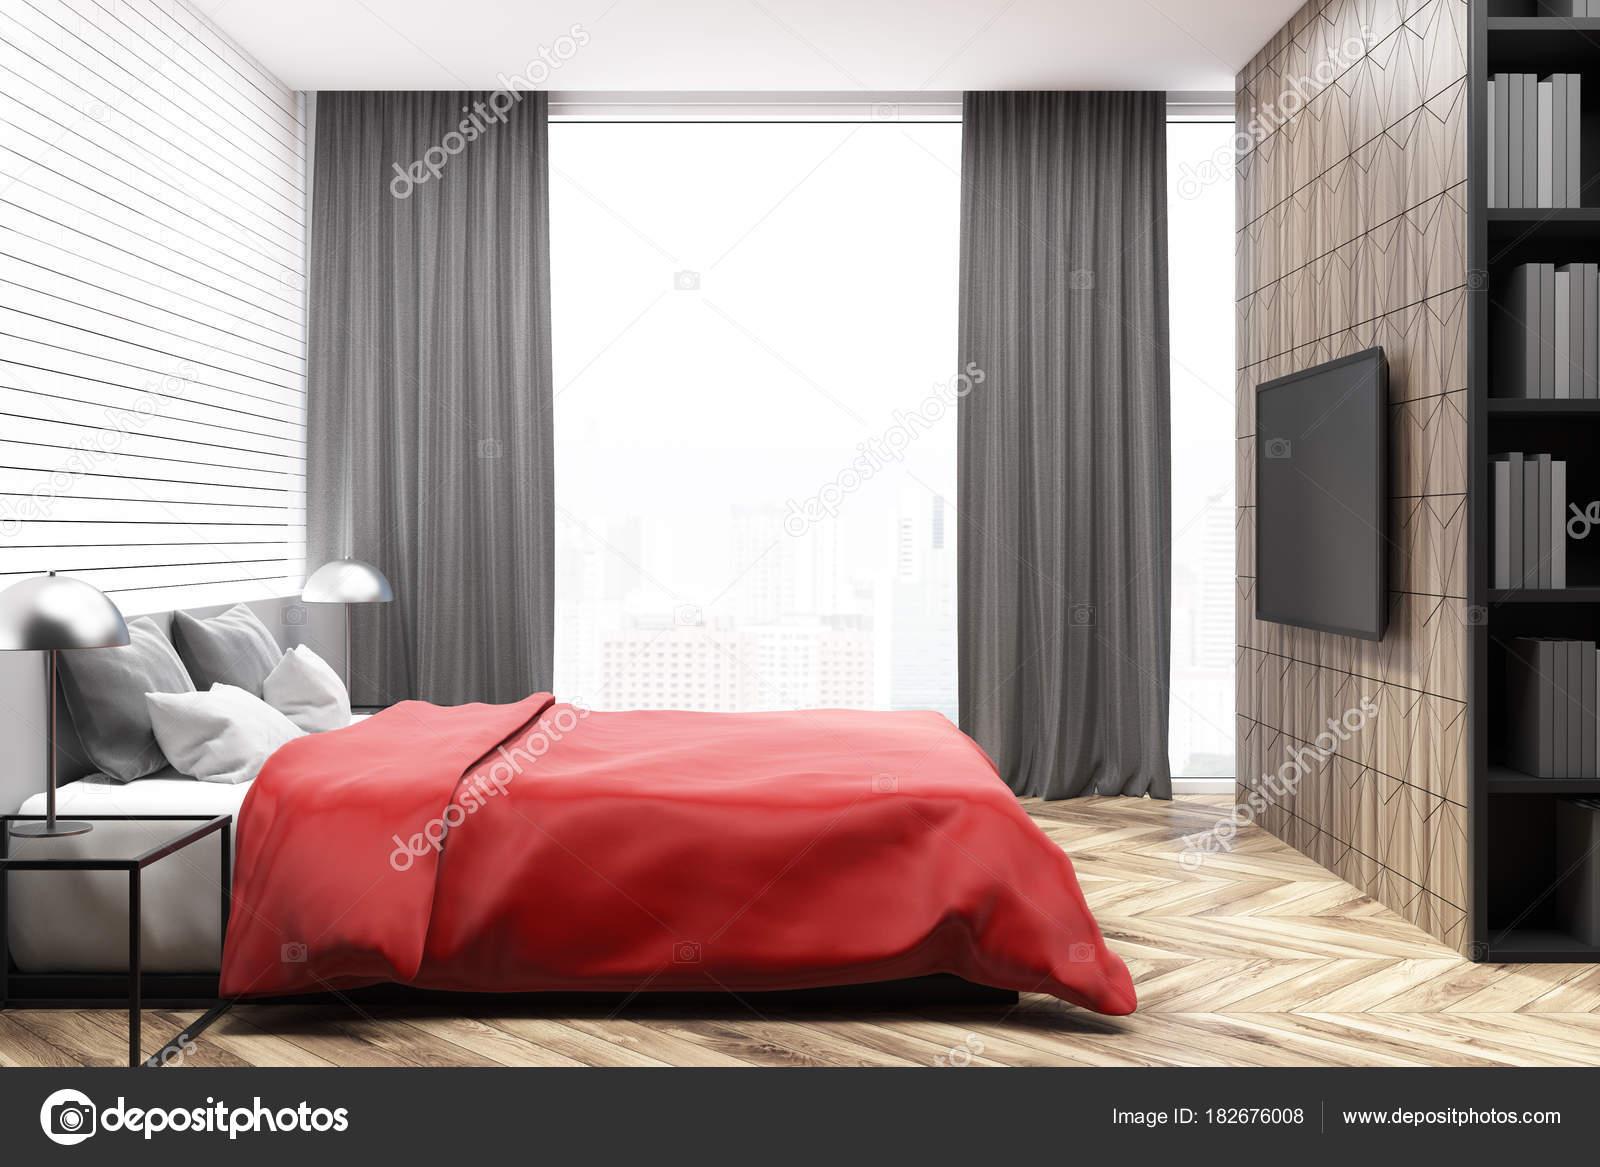 https://st3.depositphotos.com/2673929/18267/i/1600/depositphotos_182676008-stock-photo-white-bedroom-interior-red-bed.jpg